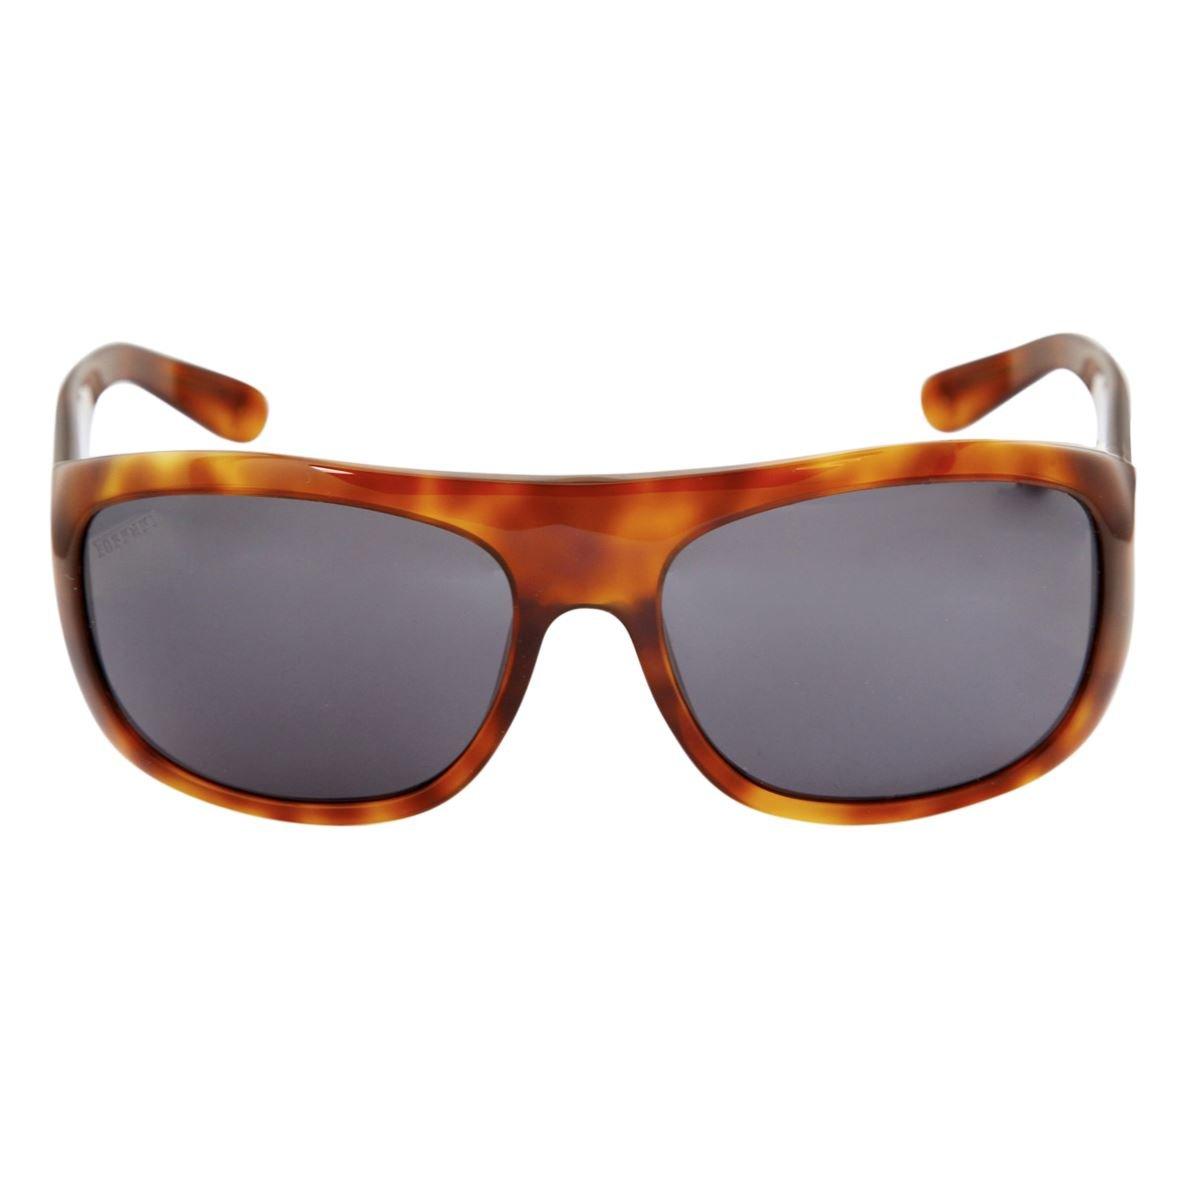 FERRARI FR0042 116 Gafas de Sol - Tortoise: Amazon.es: Ropa ...